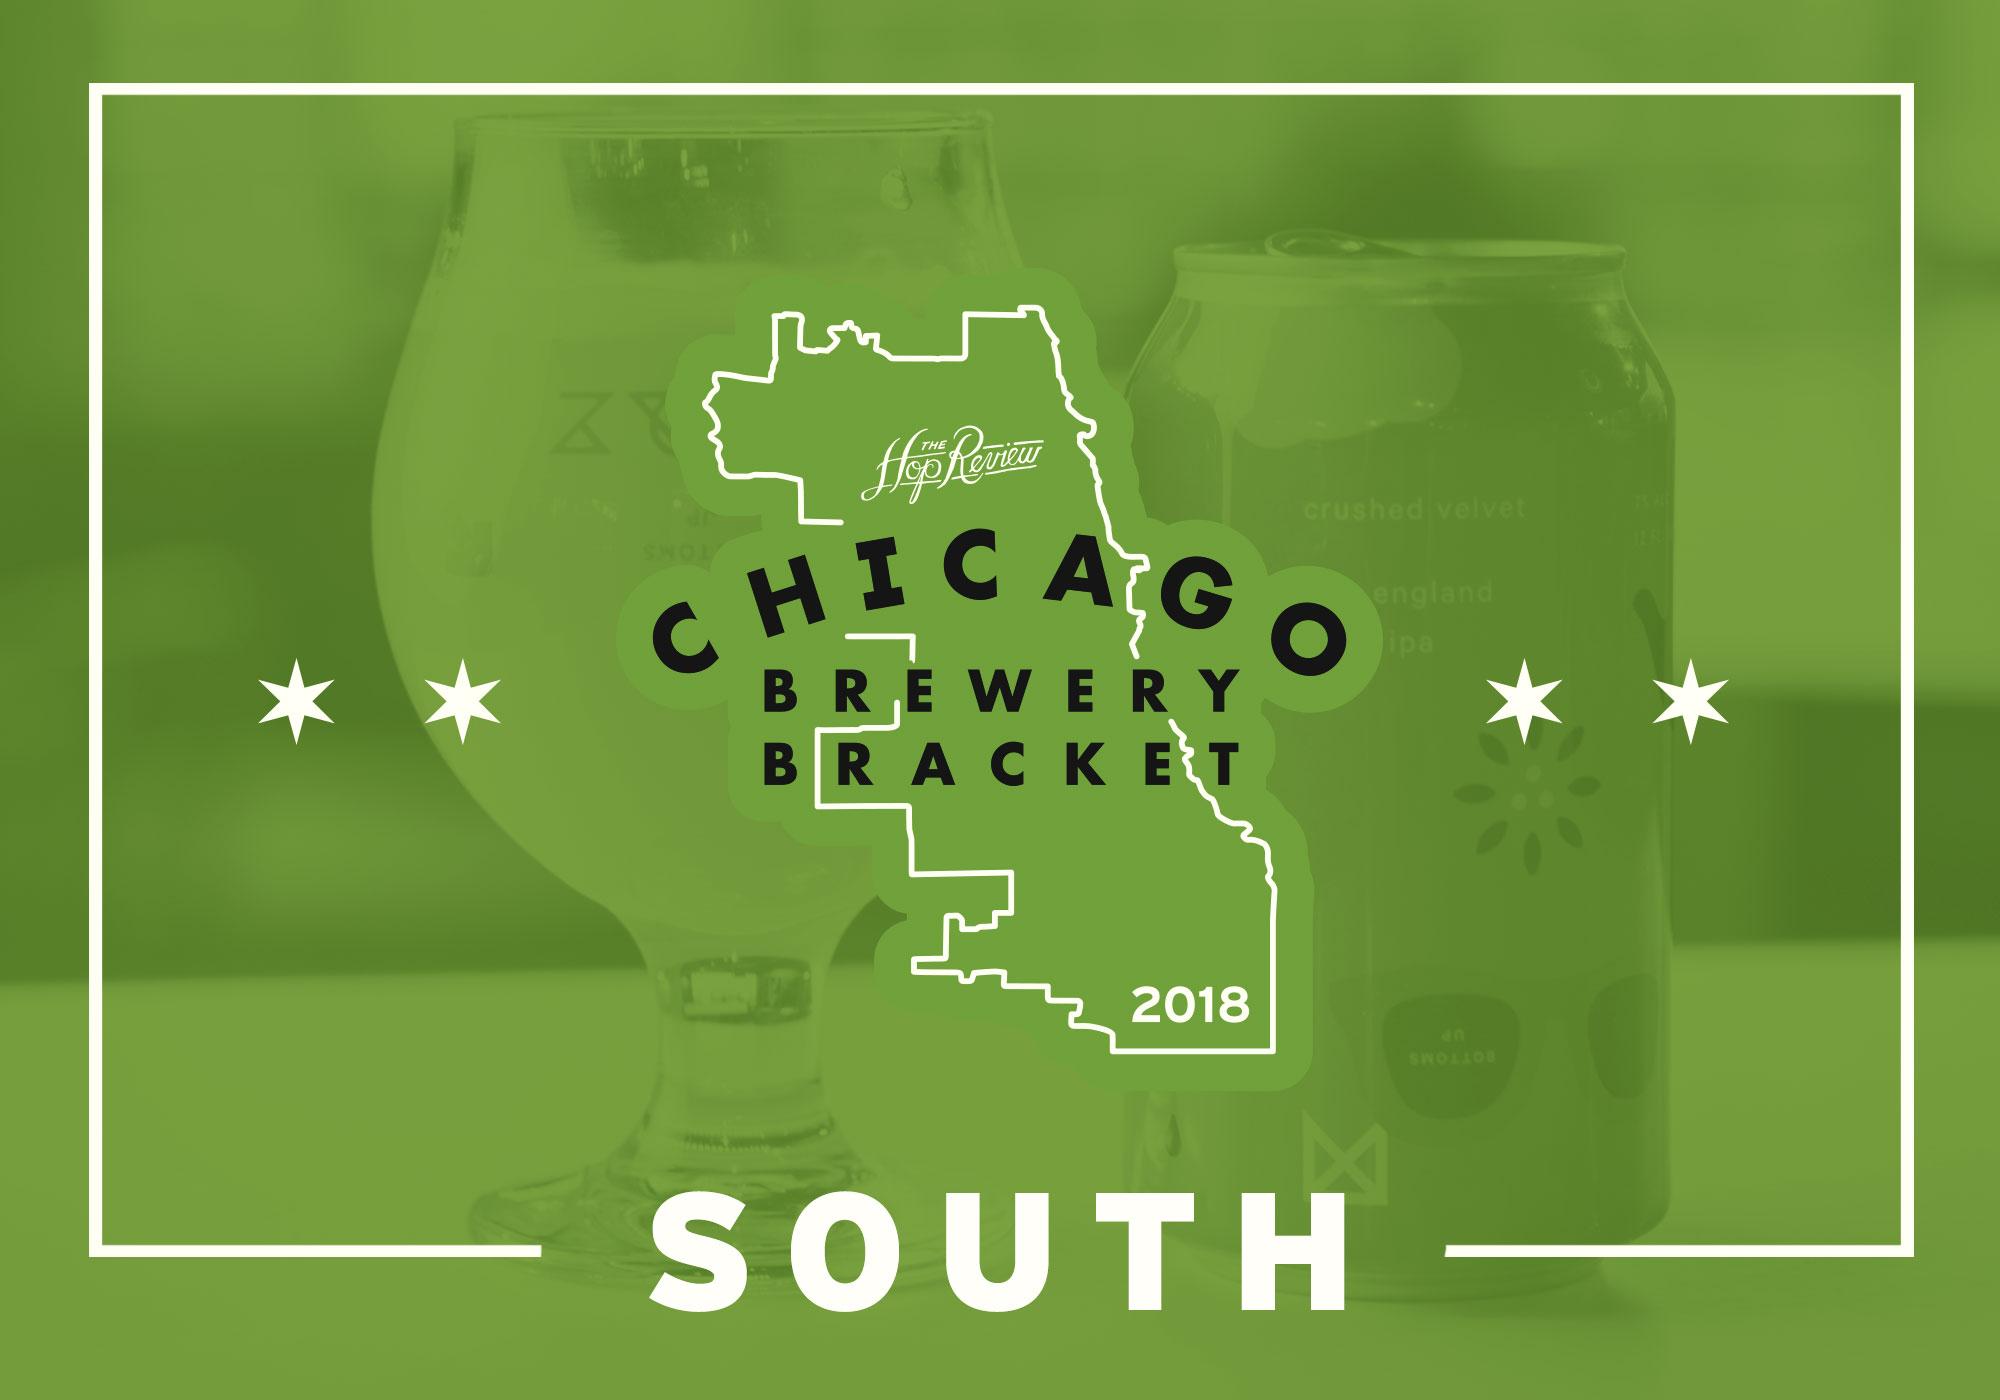 ChicagoBreweryBracket_2018_SOUTH.jpg